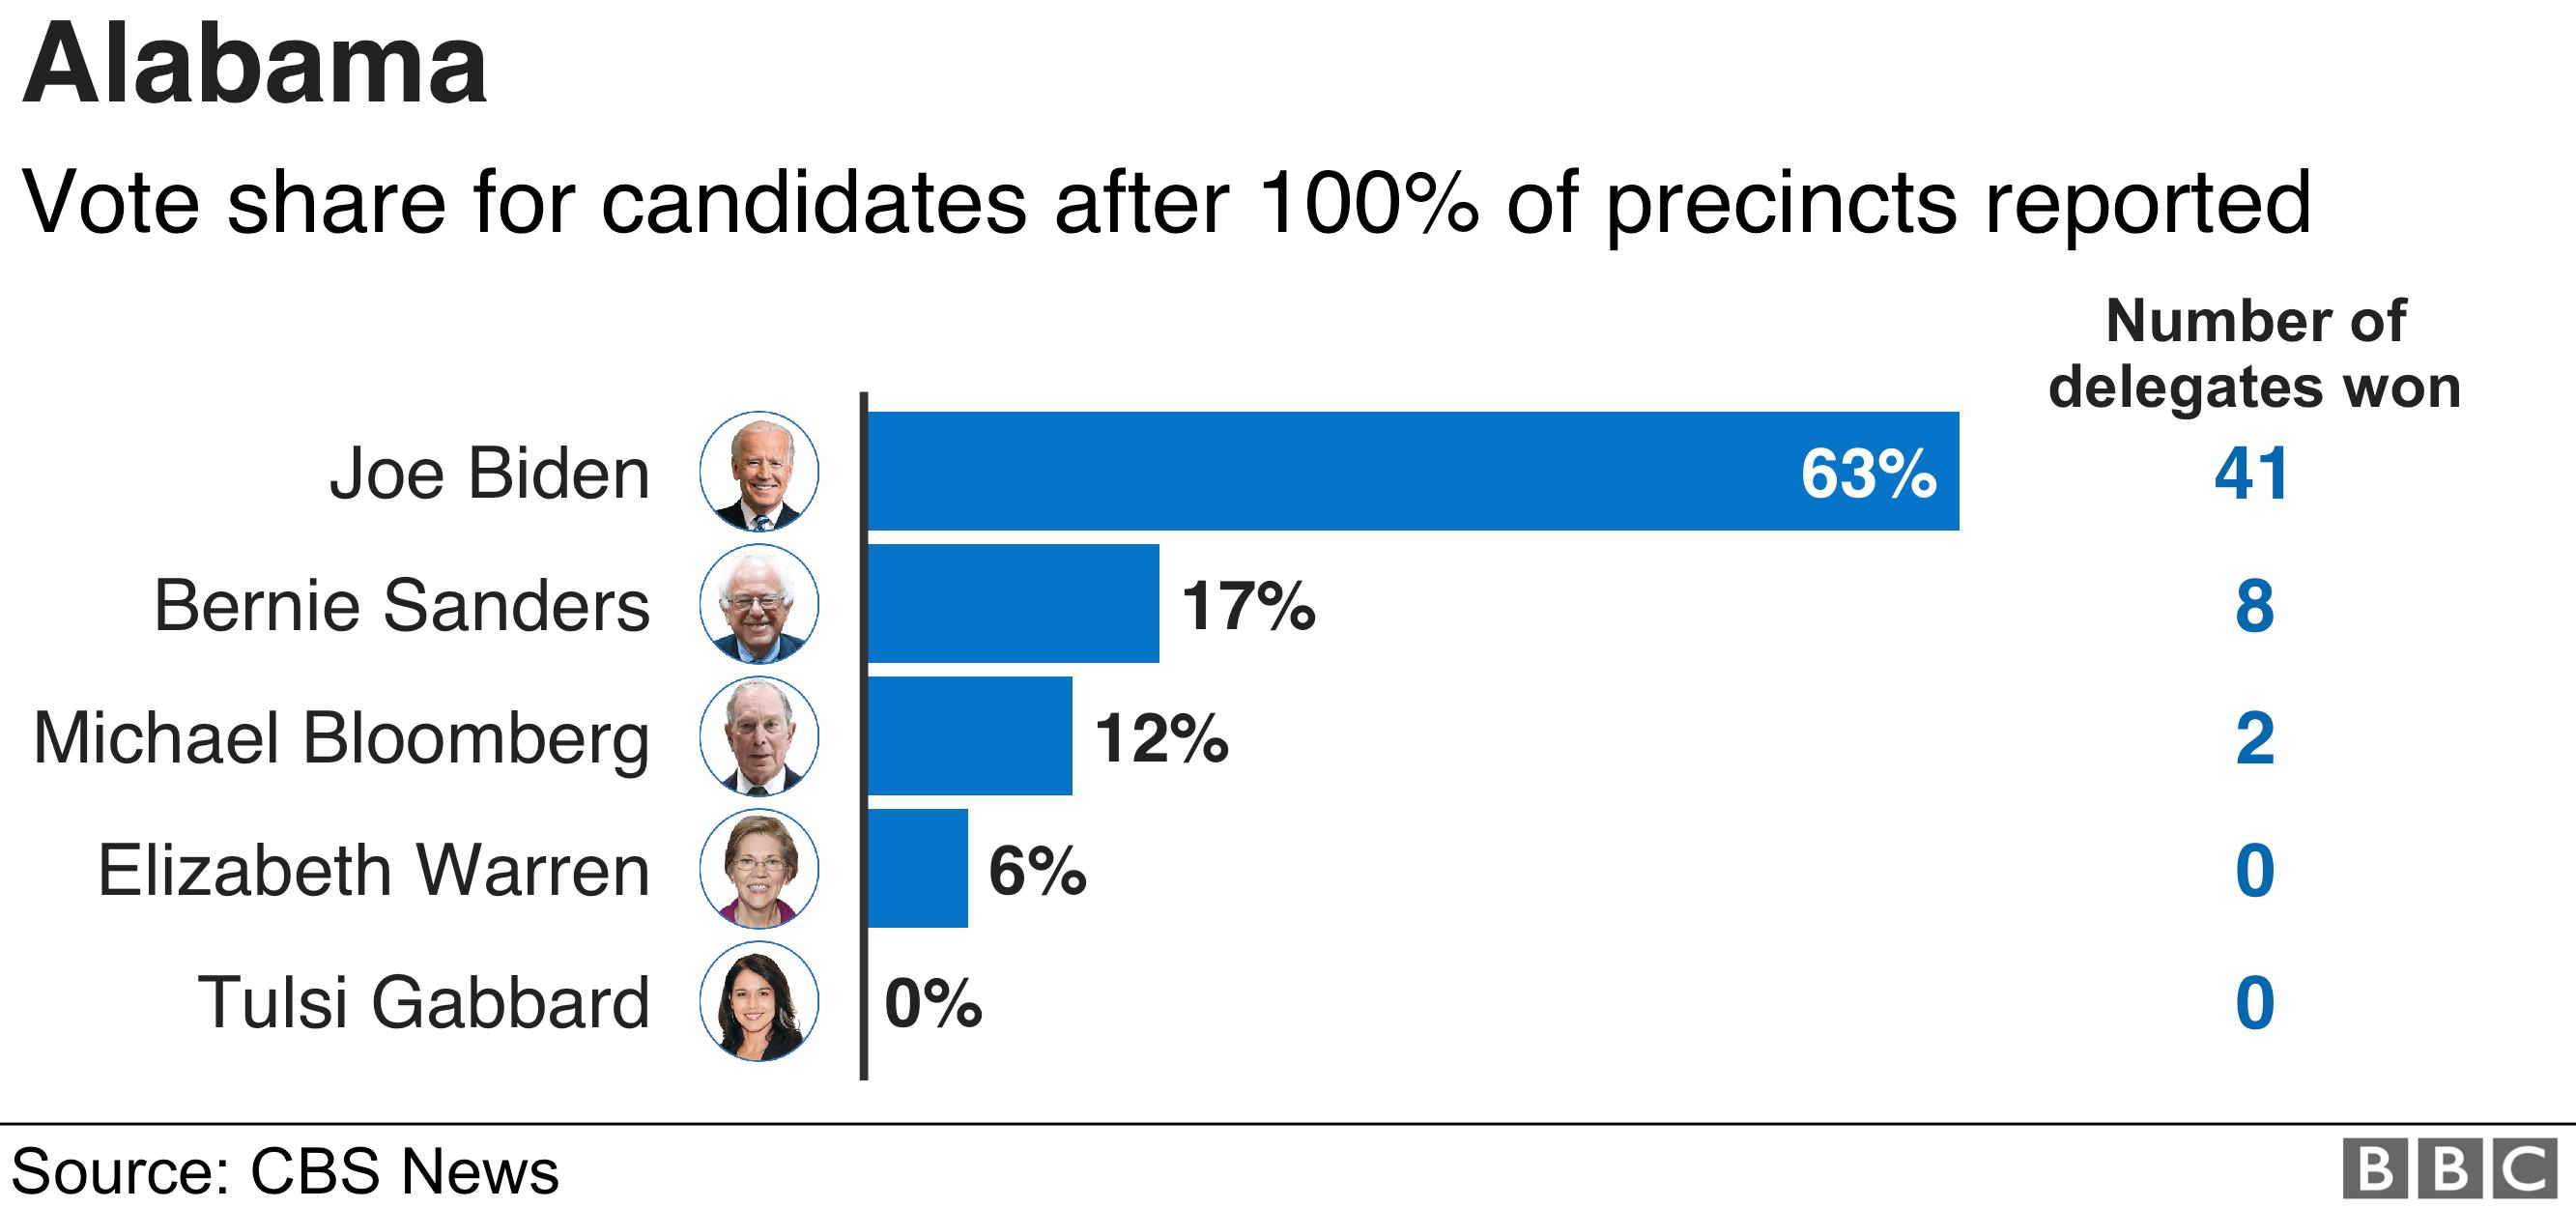 Alabama results